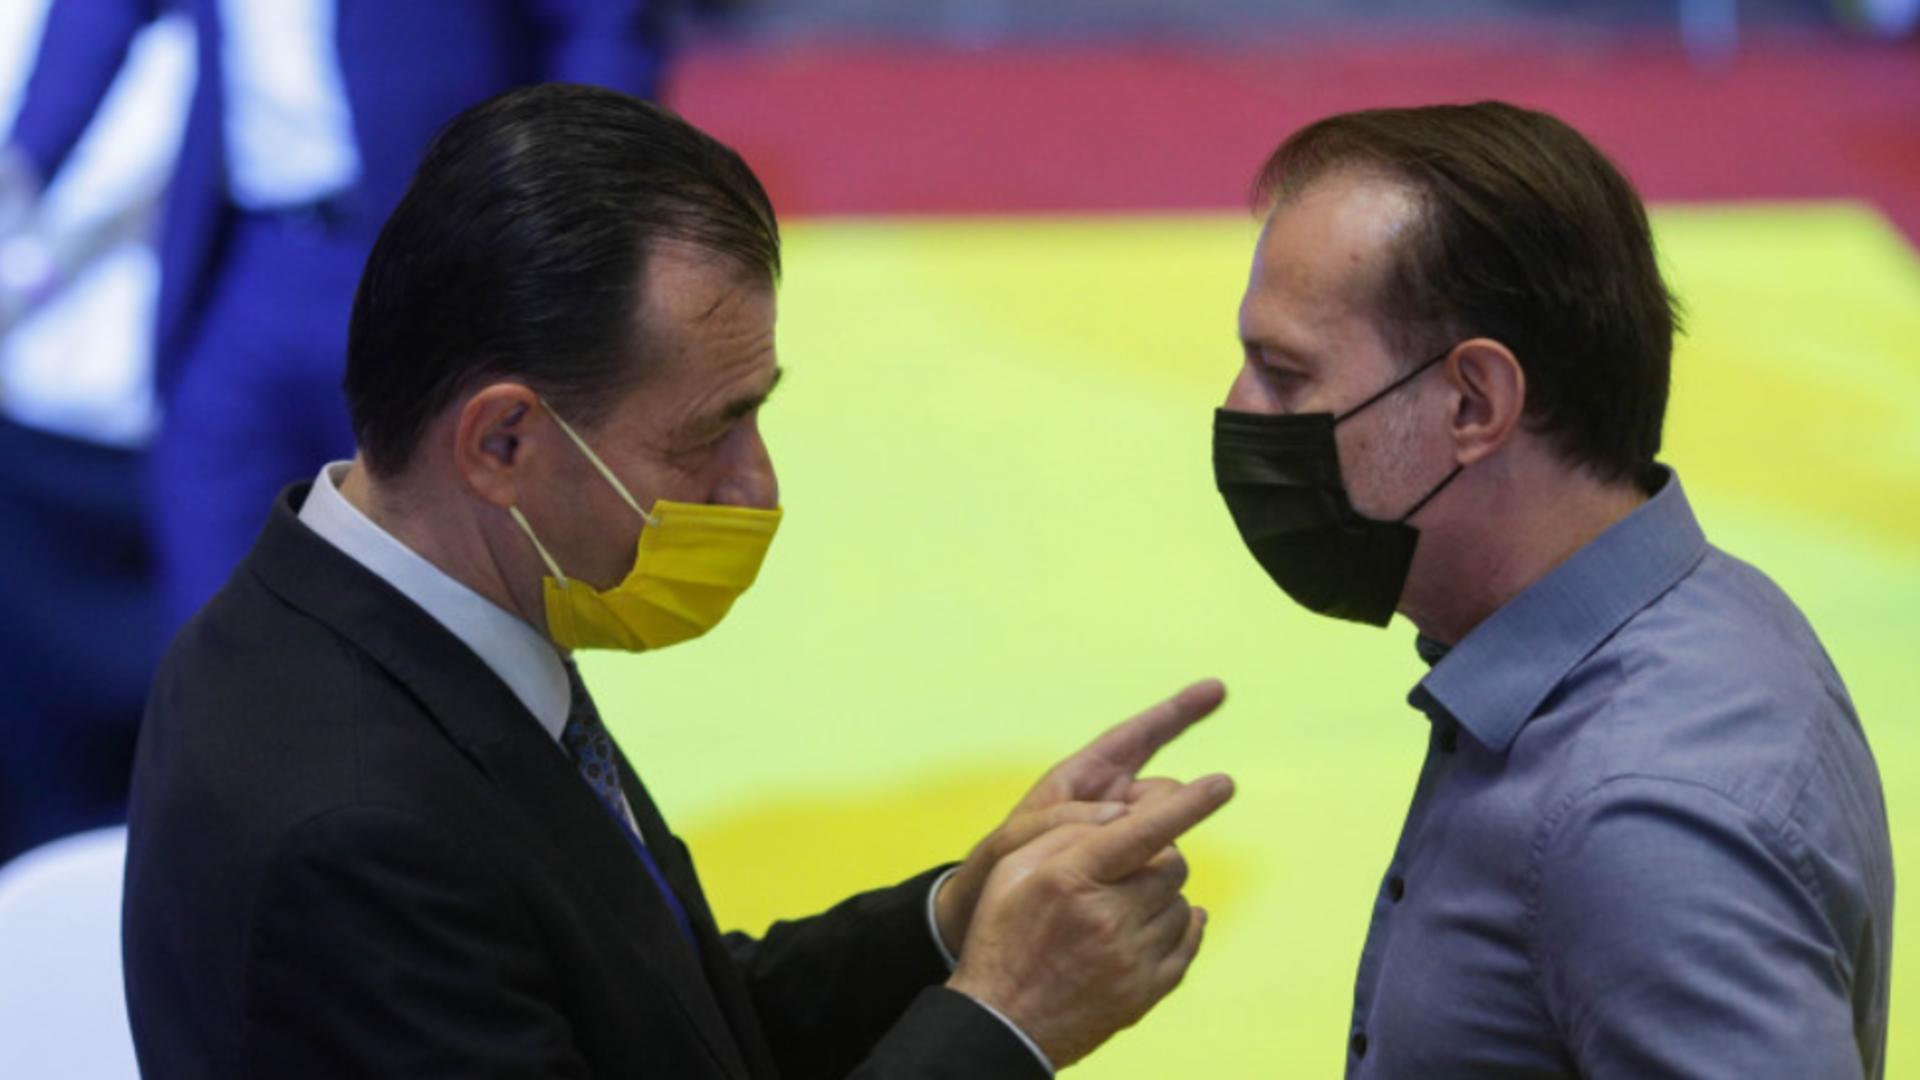 Ludovic Orban și Florin Cîțu Foto: INQUAM/Octav Ganea